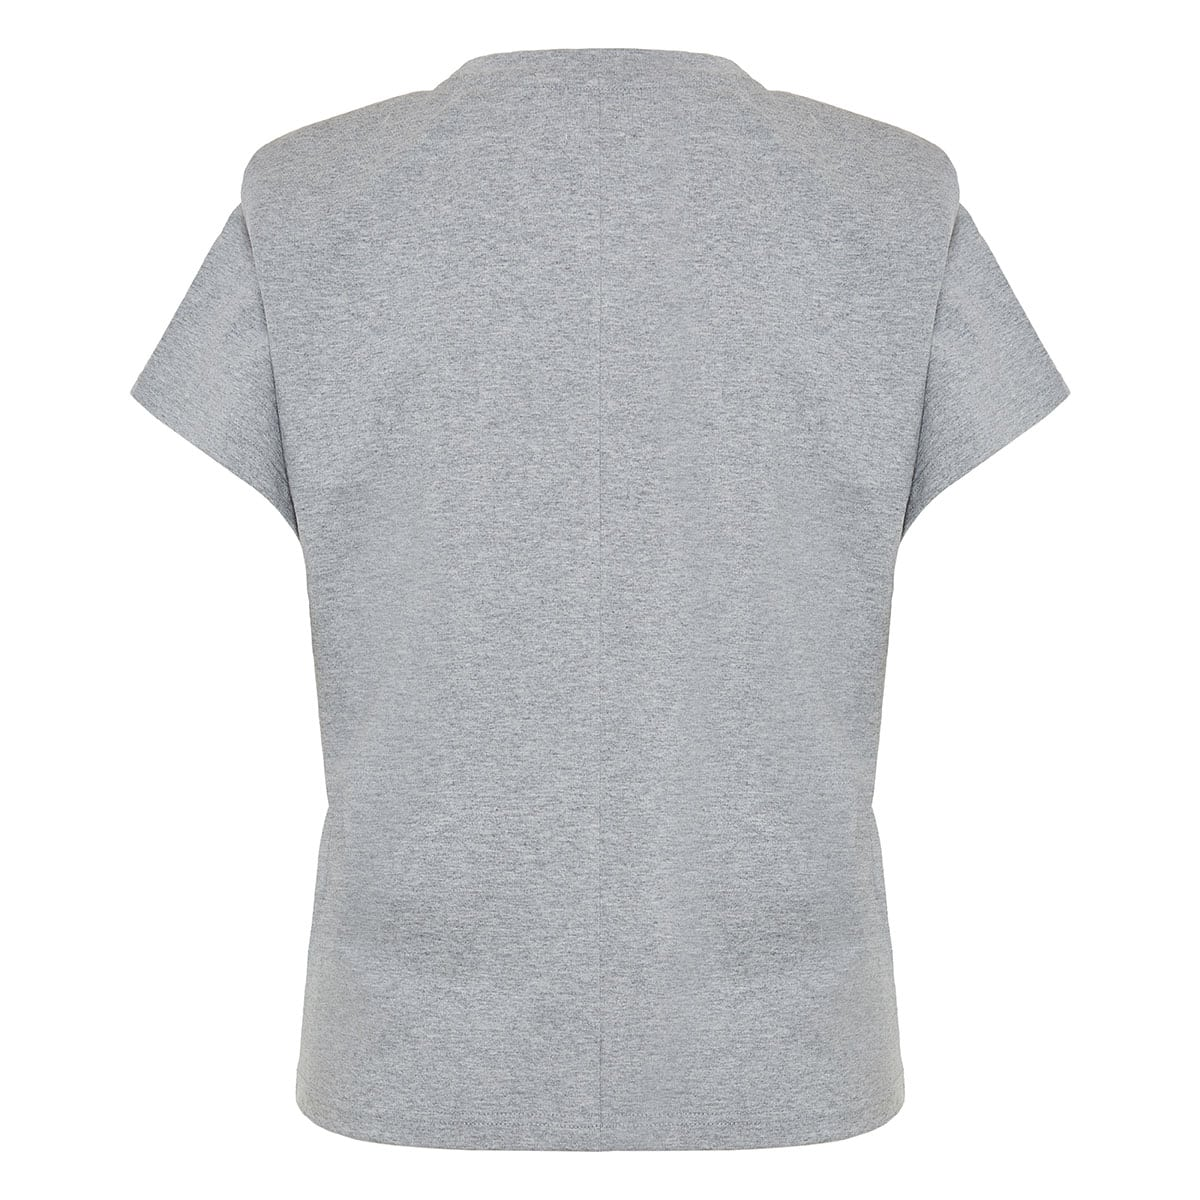 Belita knotted t-shirt